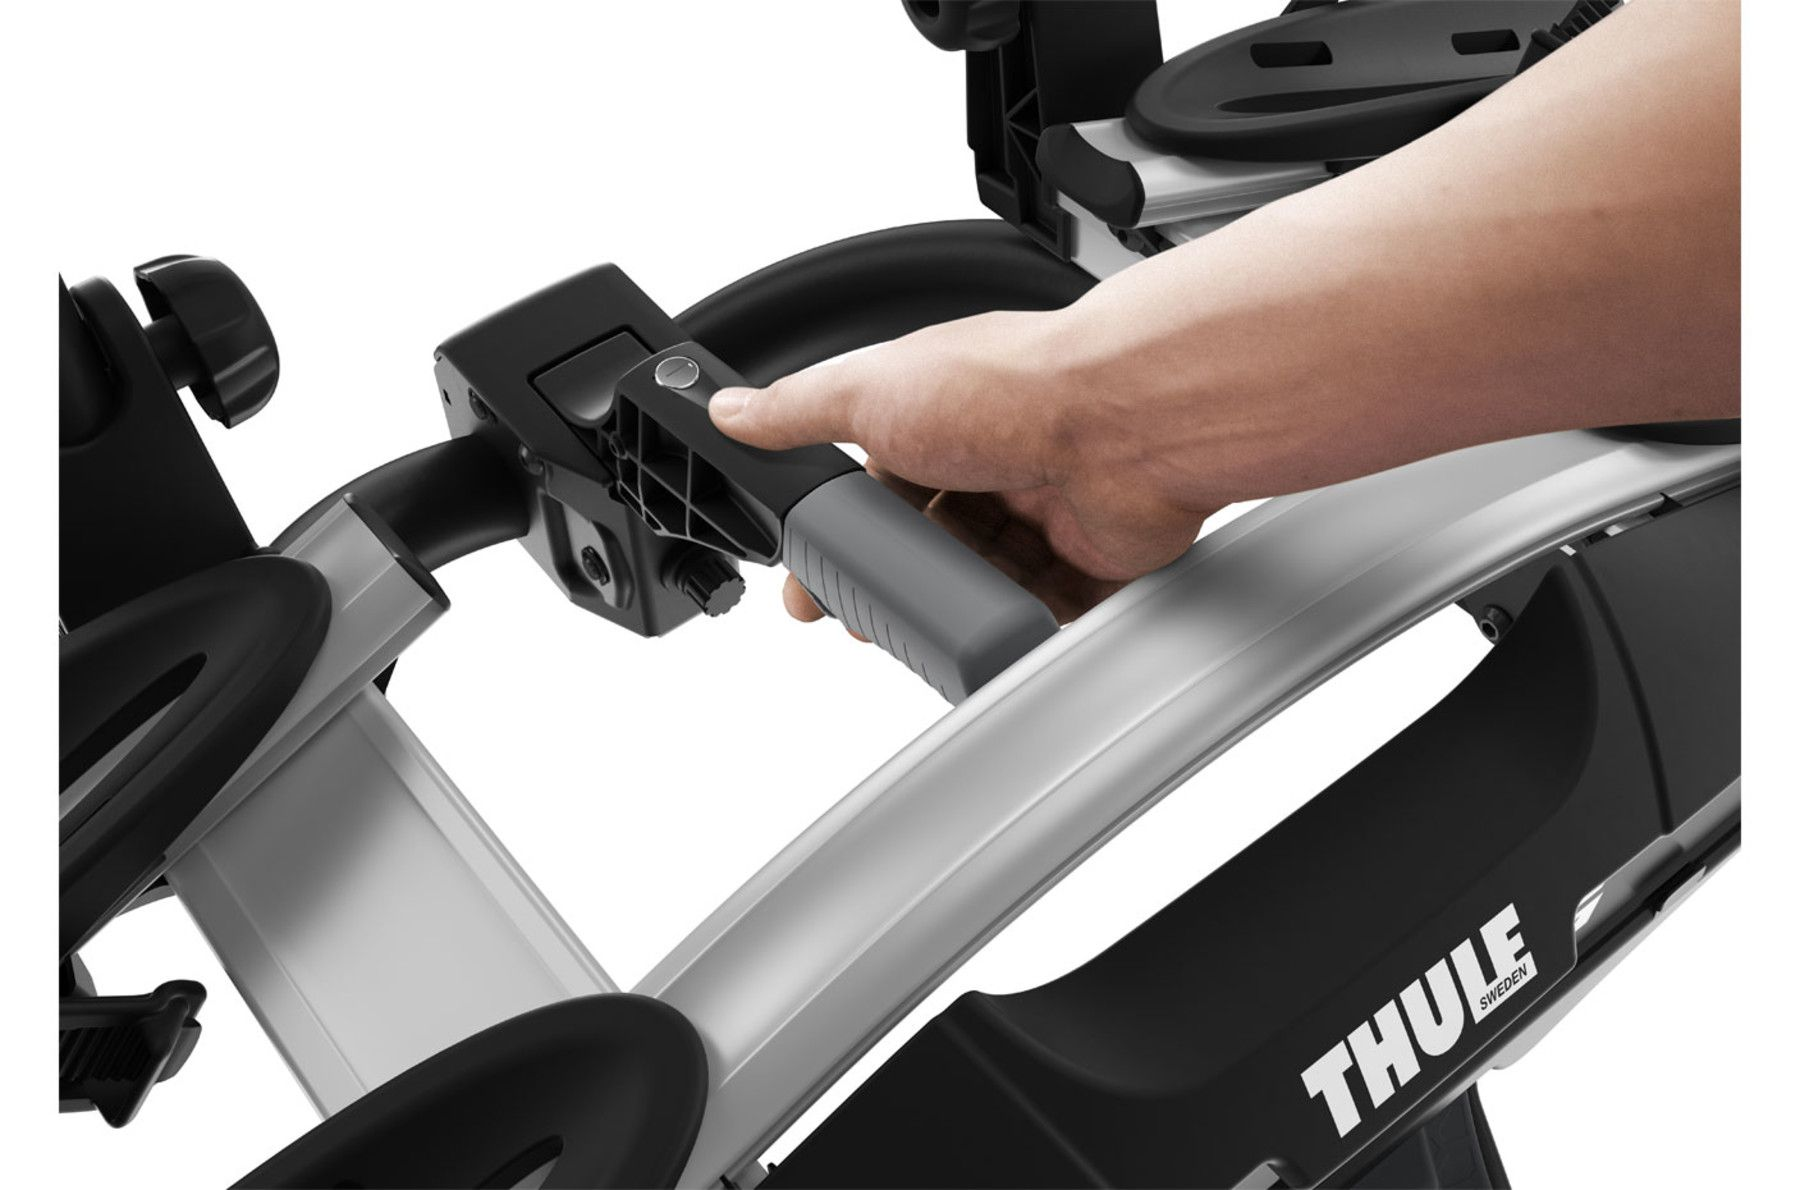 Suporte de Engate para Bicicleta Thule VeloCompact 2 Bicicletas